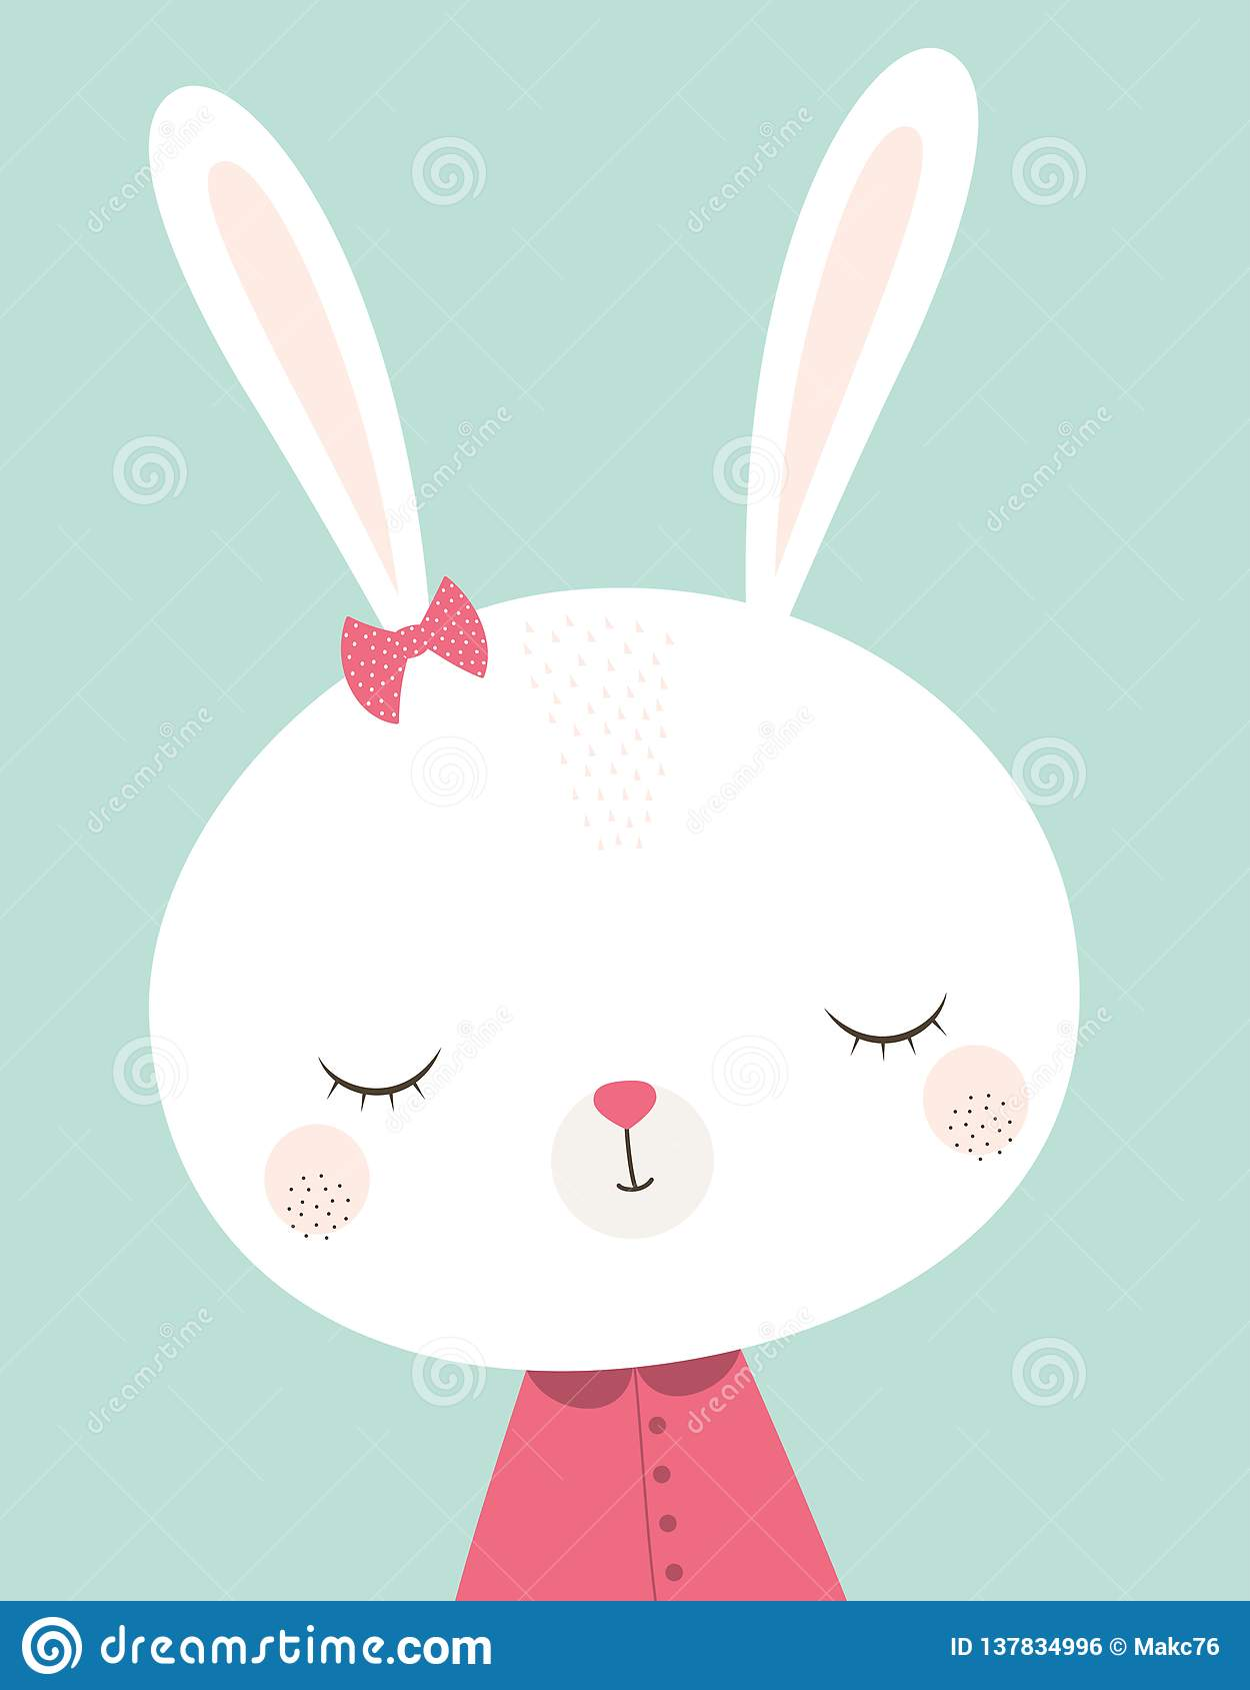 Conejo de conejito lindo